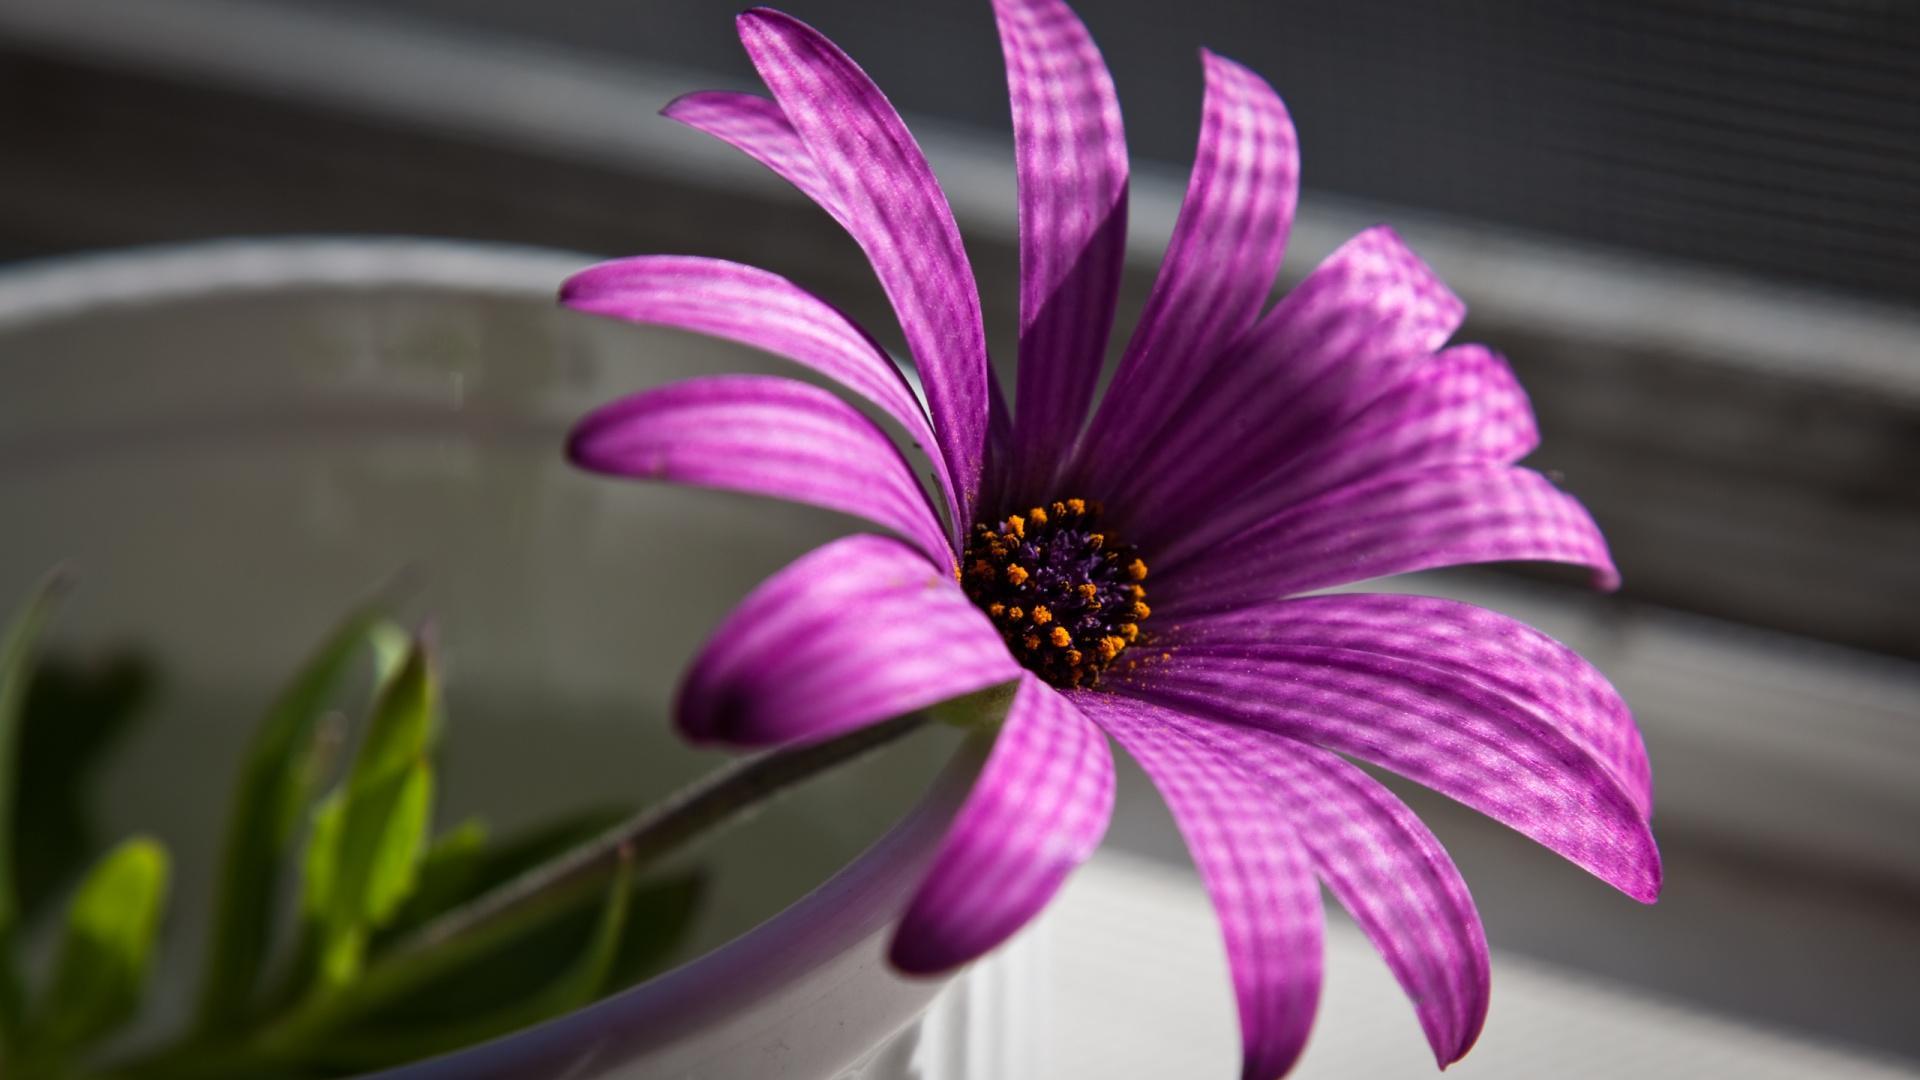 Flower Wallpaper 1920x1080 Posted By Ryan Mercado